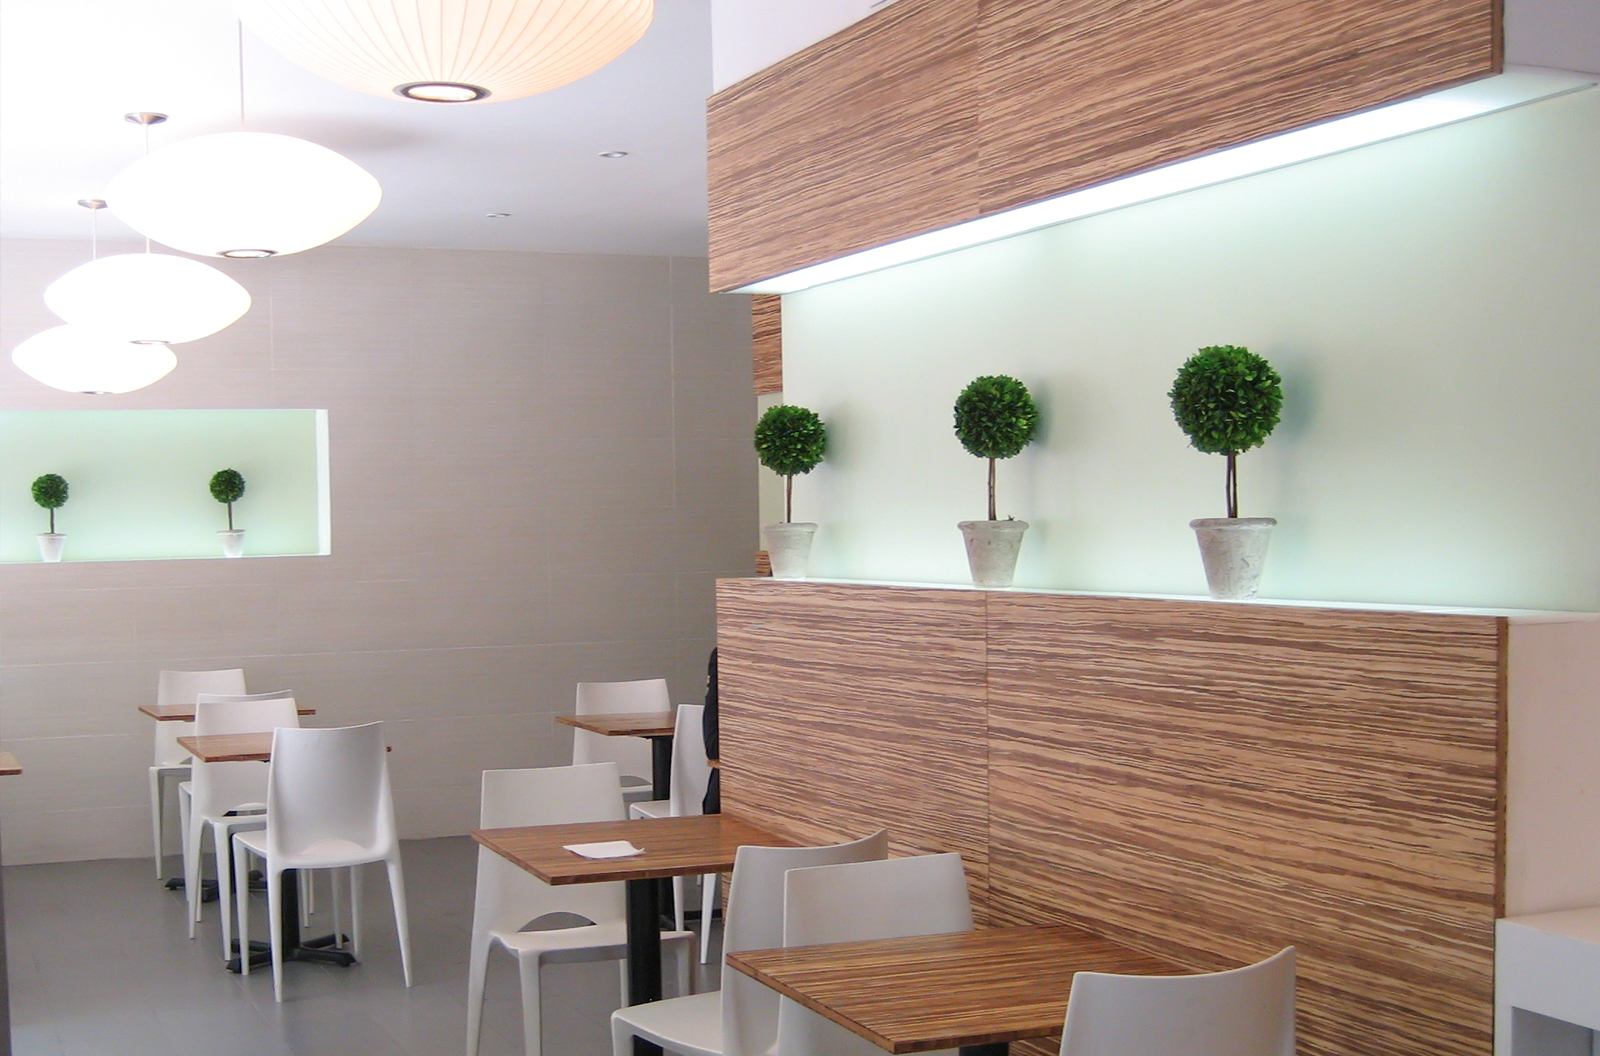 Calista Mandarina Studio NYC Healthy Food restaurant Design_5.jpg